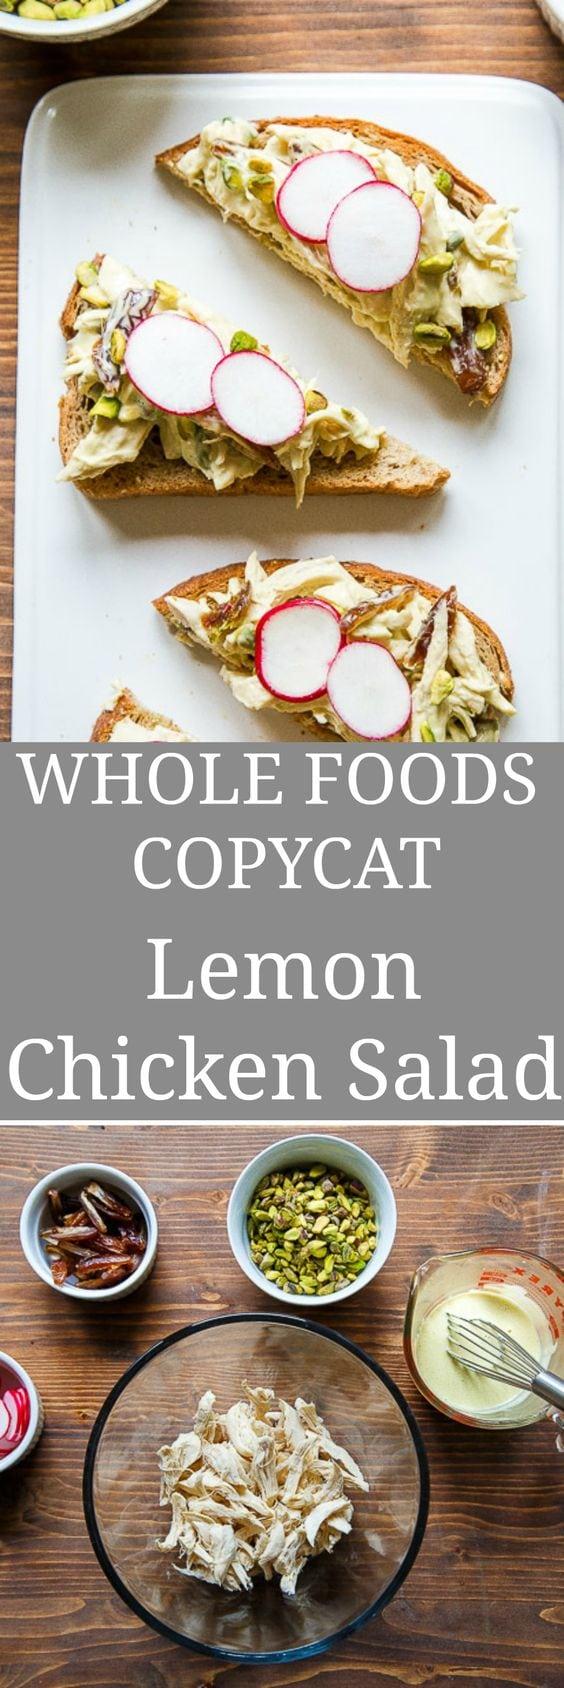 Lemon Chicken Salad: copycat Whole Foods Lemon Aioli Chicken Salad with Pistachios and Dates! #chickensalad #lemon #lemonchicken #lemonaioli #wholefoods #wholefoodscopycat